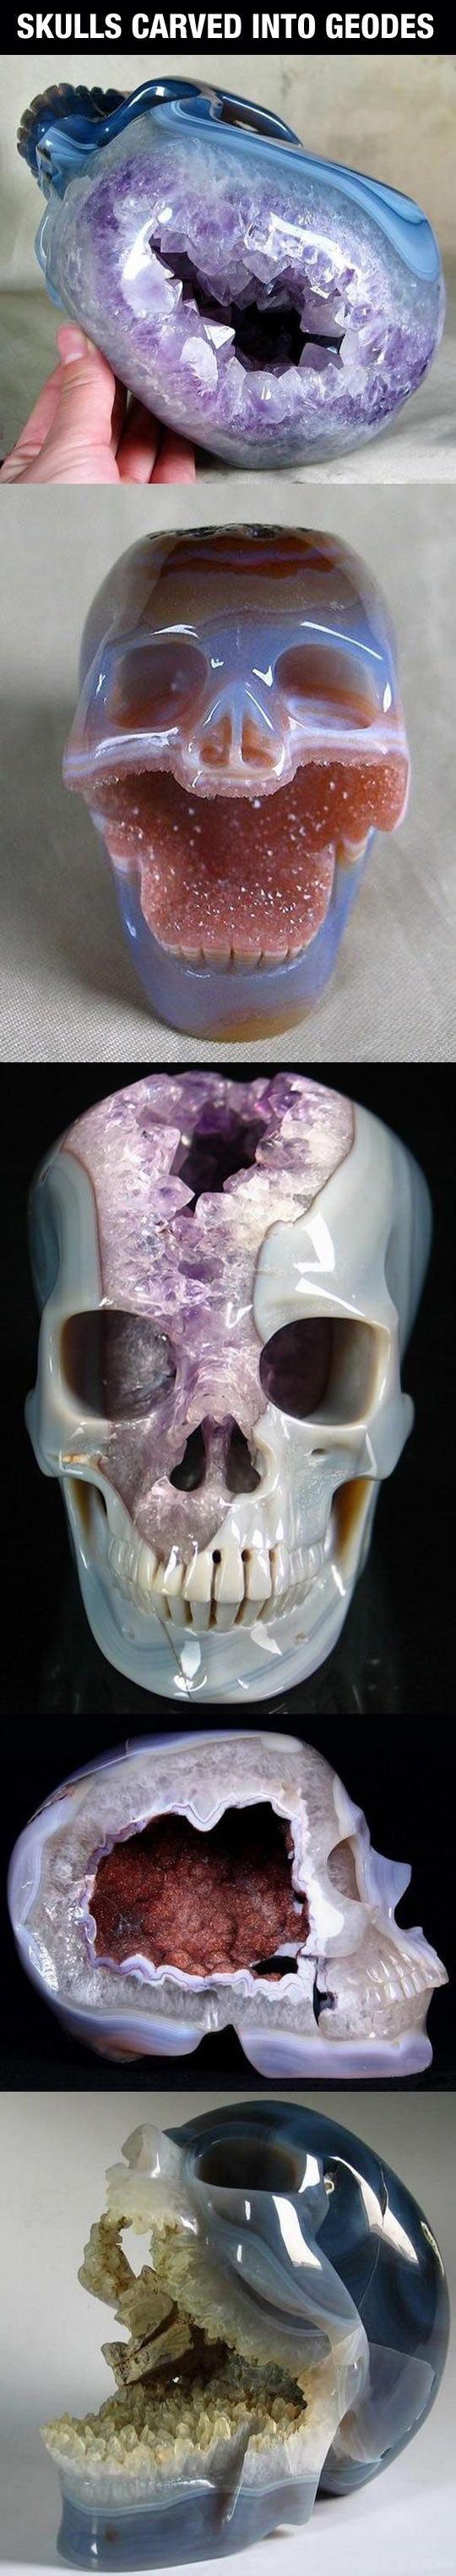 Precious Geode Skulls